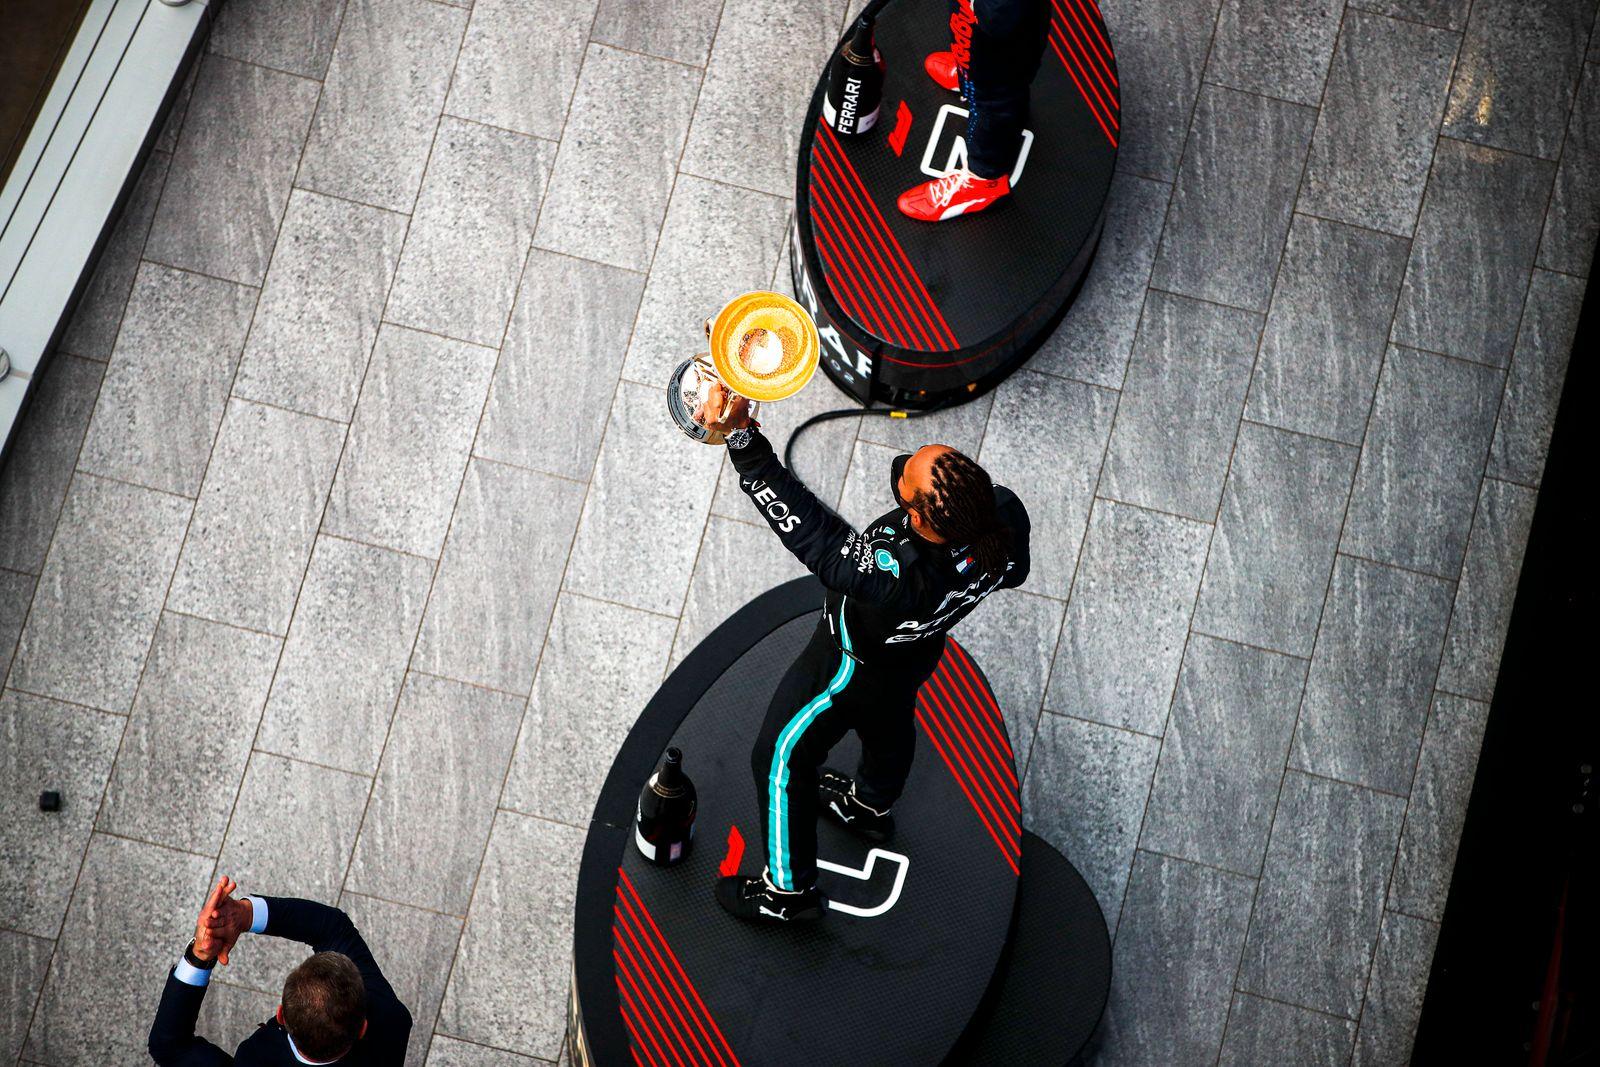 Formula 1 2021: Russian GP SOCHI AUTODROM, RUSSIAN FEDERATION - SEPTEMBER 26: Sir Lewis Hamilton, Mercedes, 1st positio